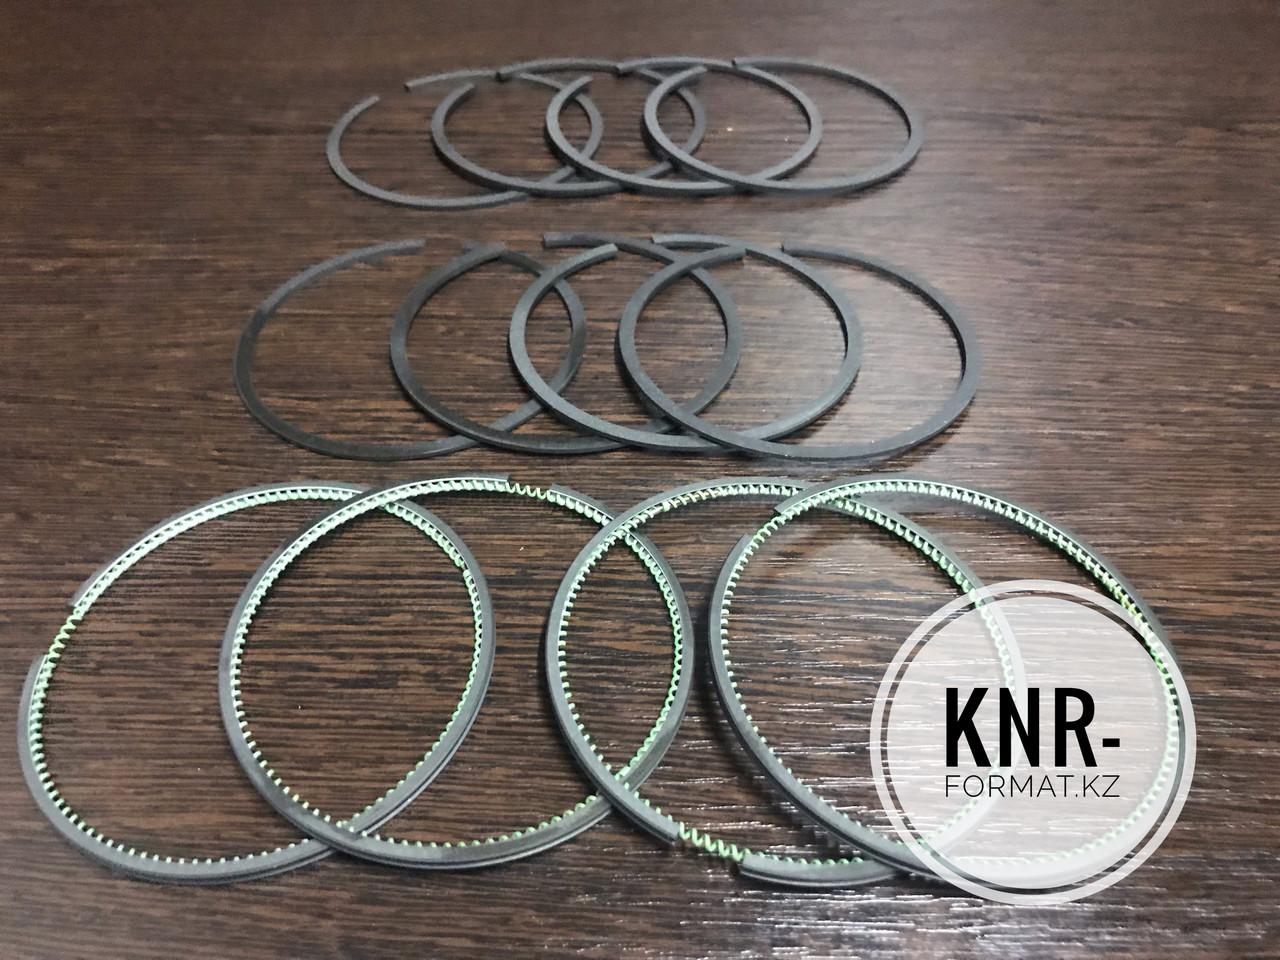 Кольца поршневые ISUZU NKR 8971094620 4JB1  100P BJ493  (4JB1T)